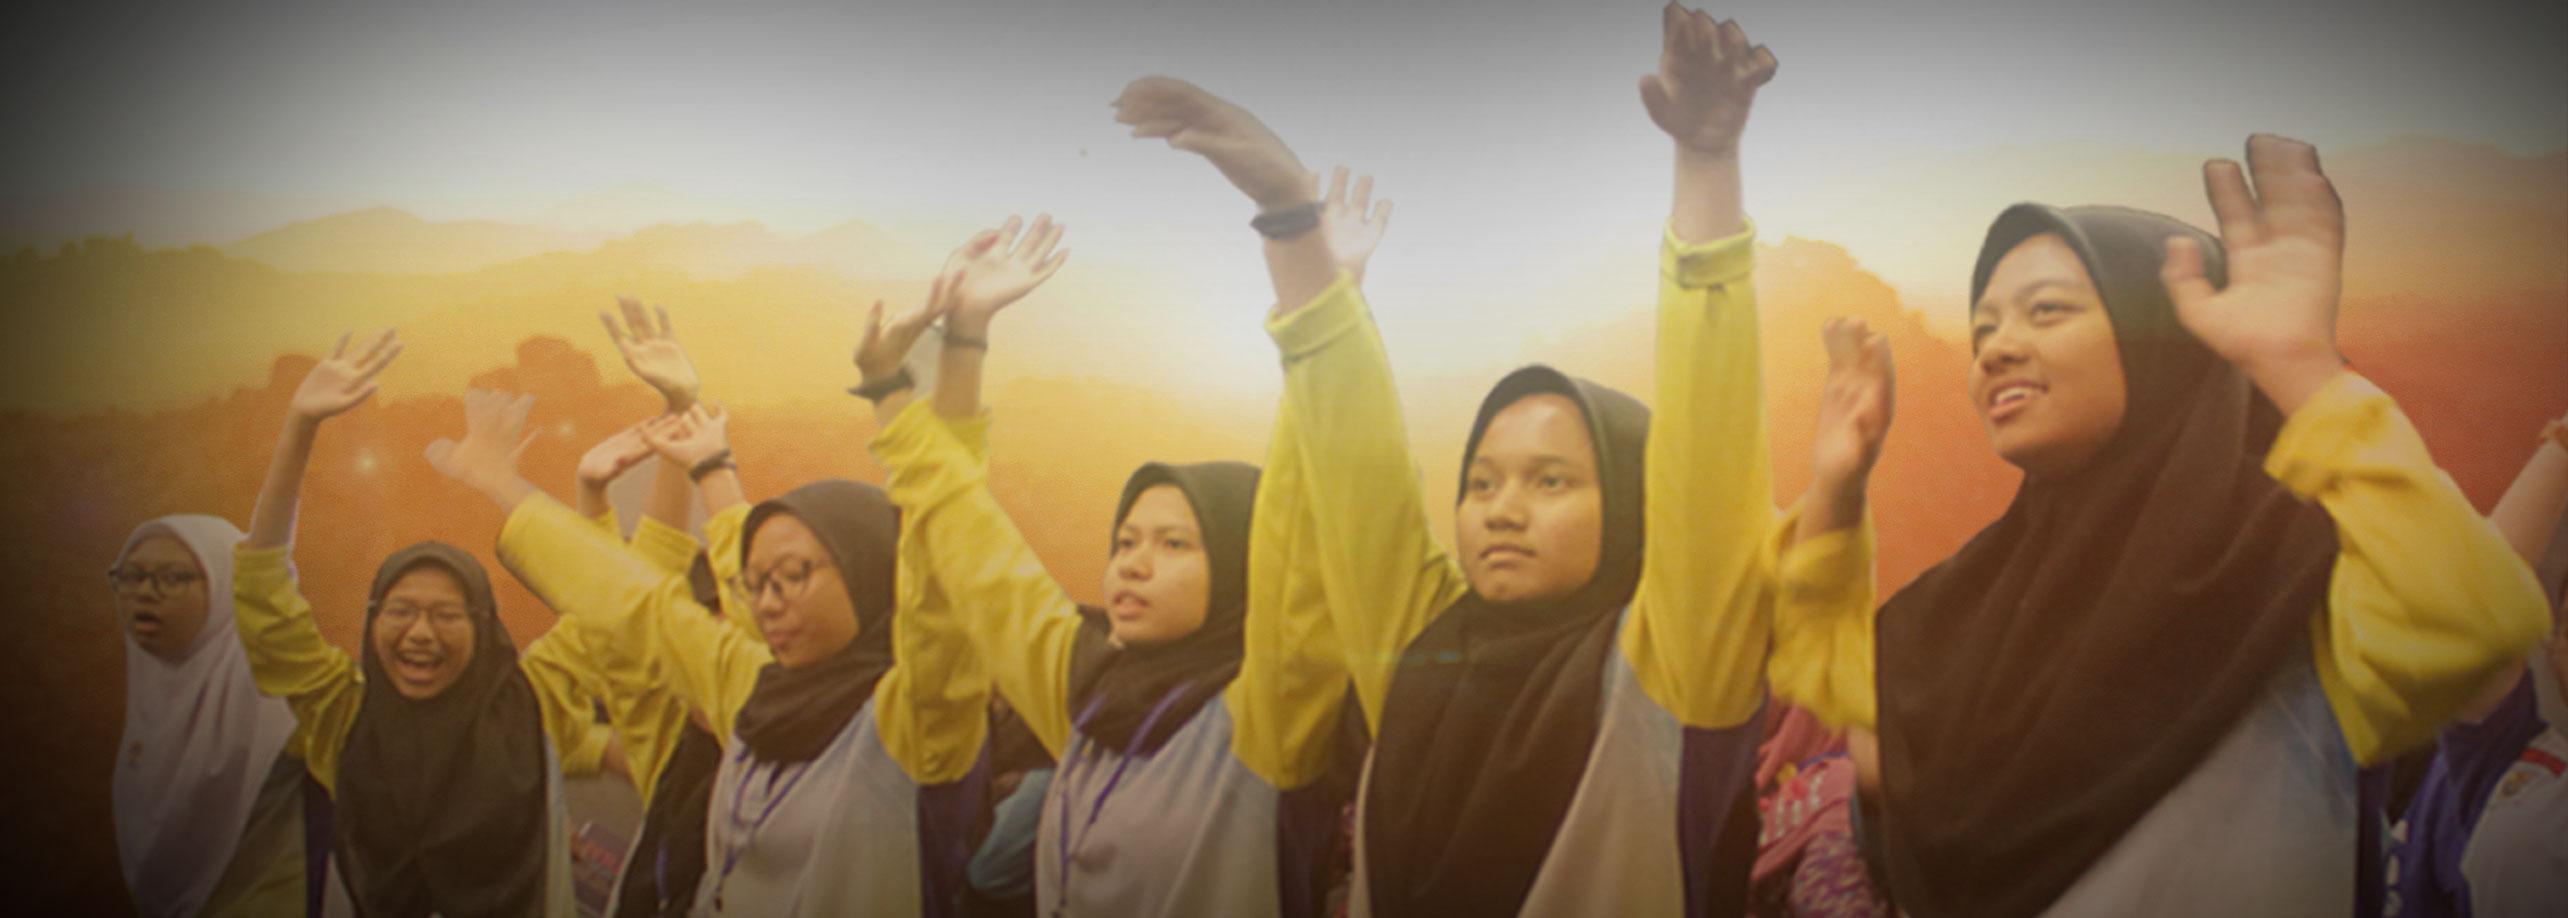 holistic youth camp